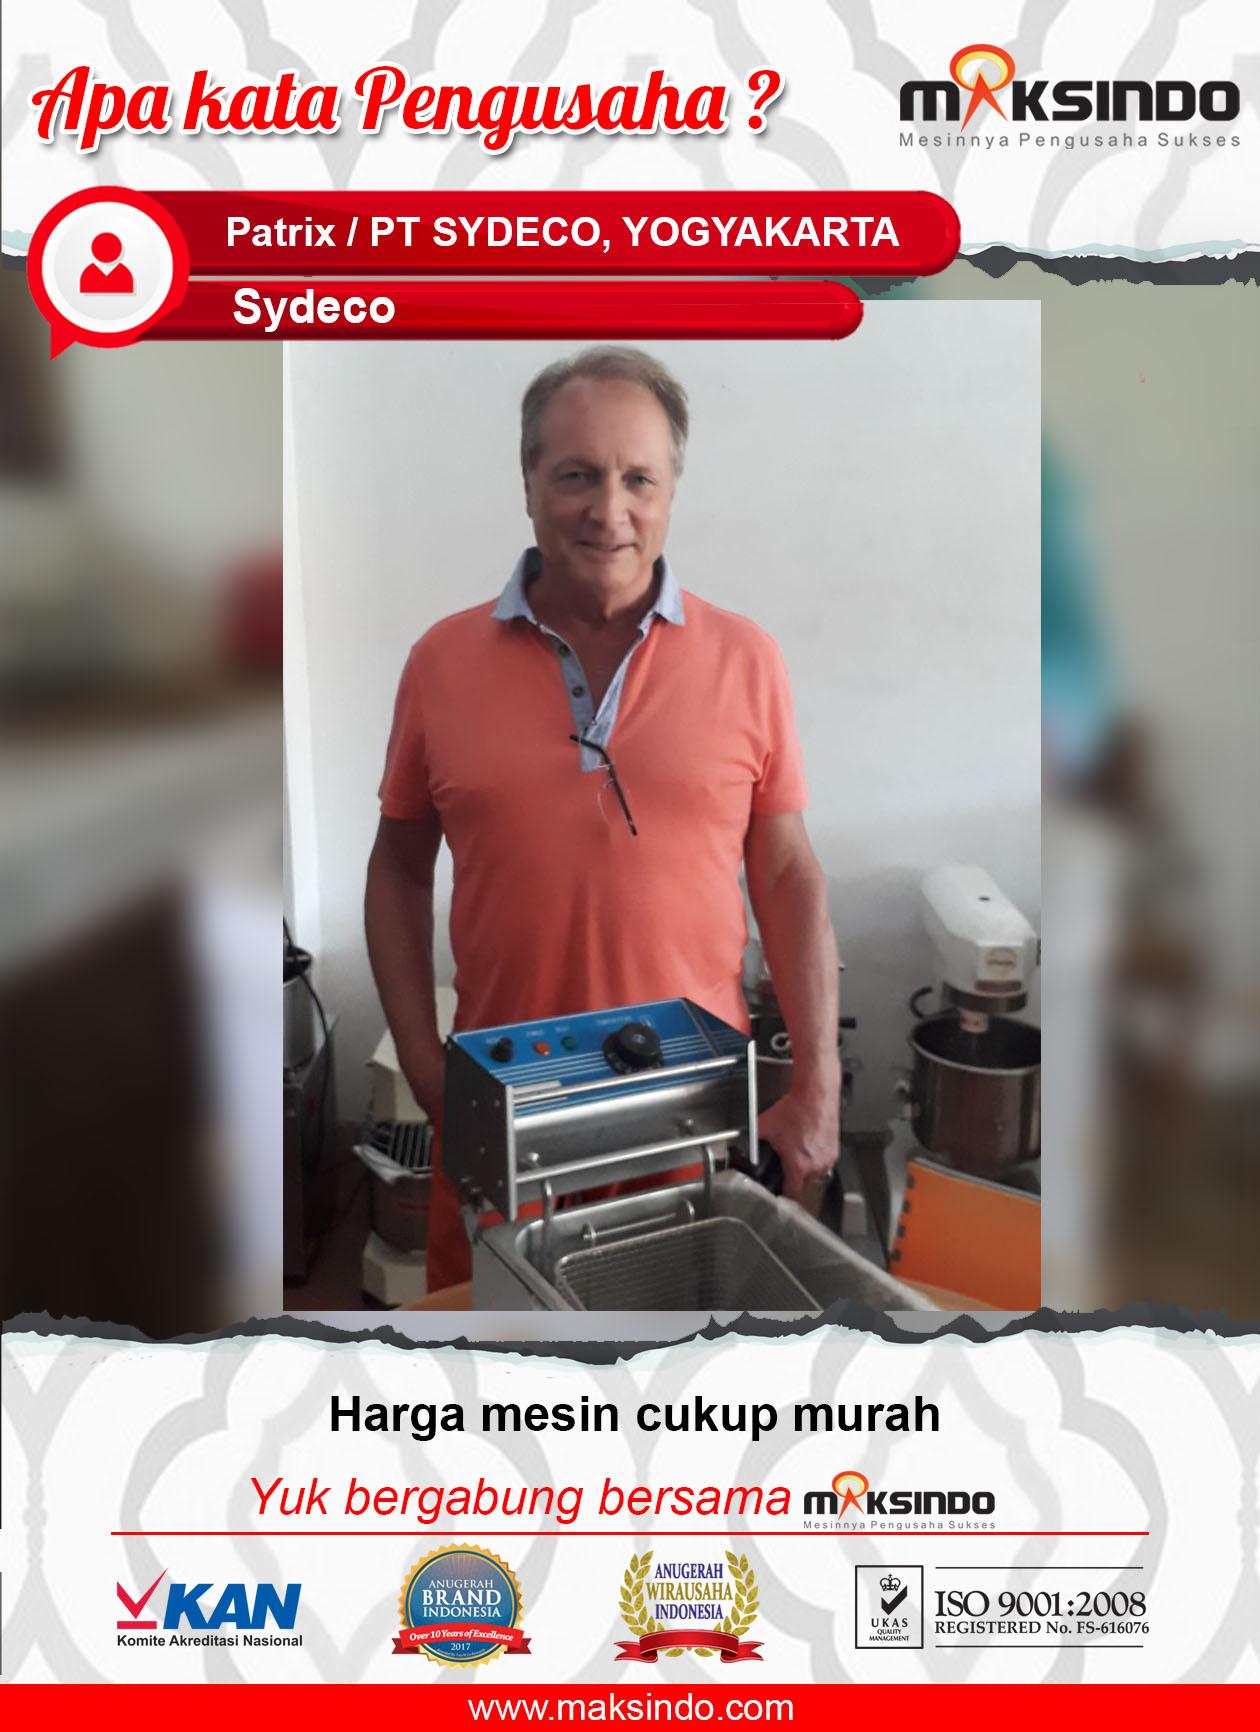 PT Sydeco : Mesin Deep Frying Maksindo Harga Cukup Murah